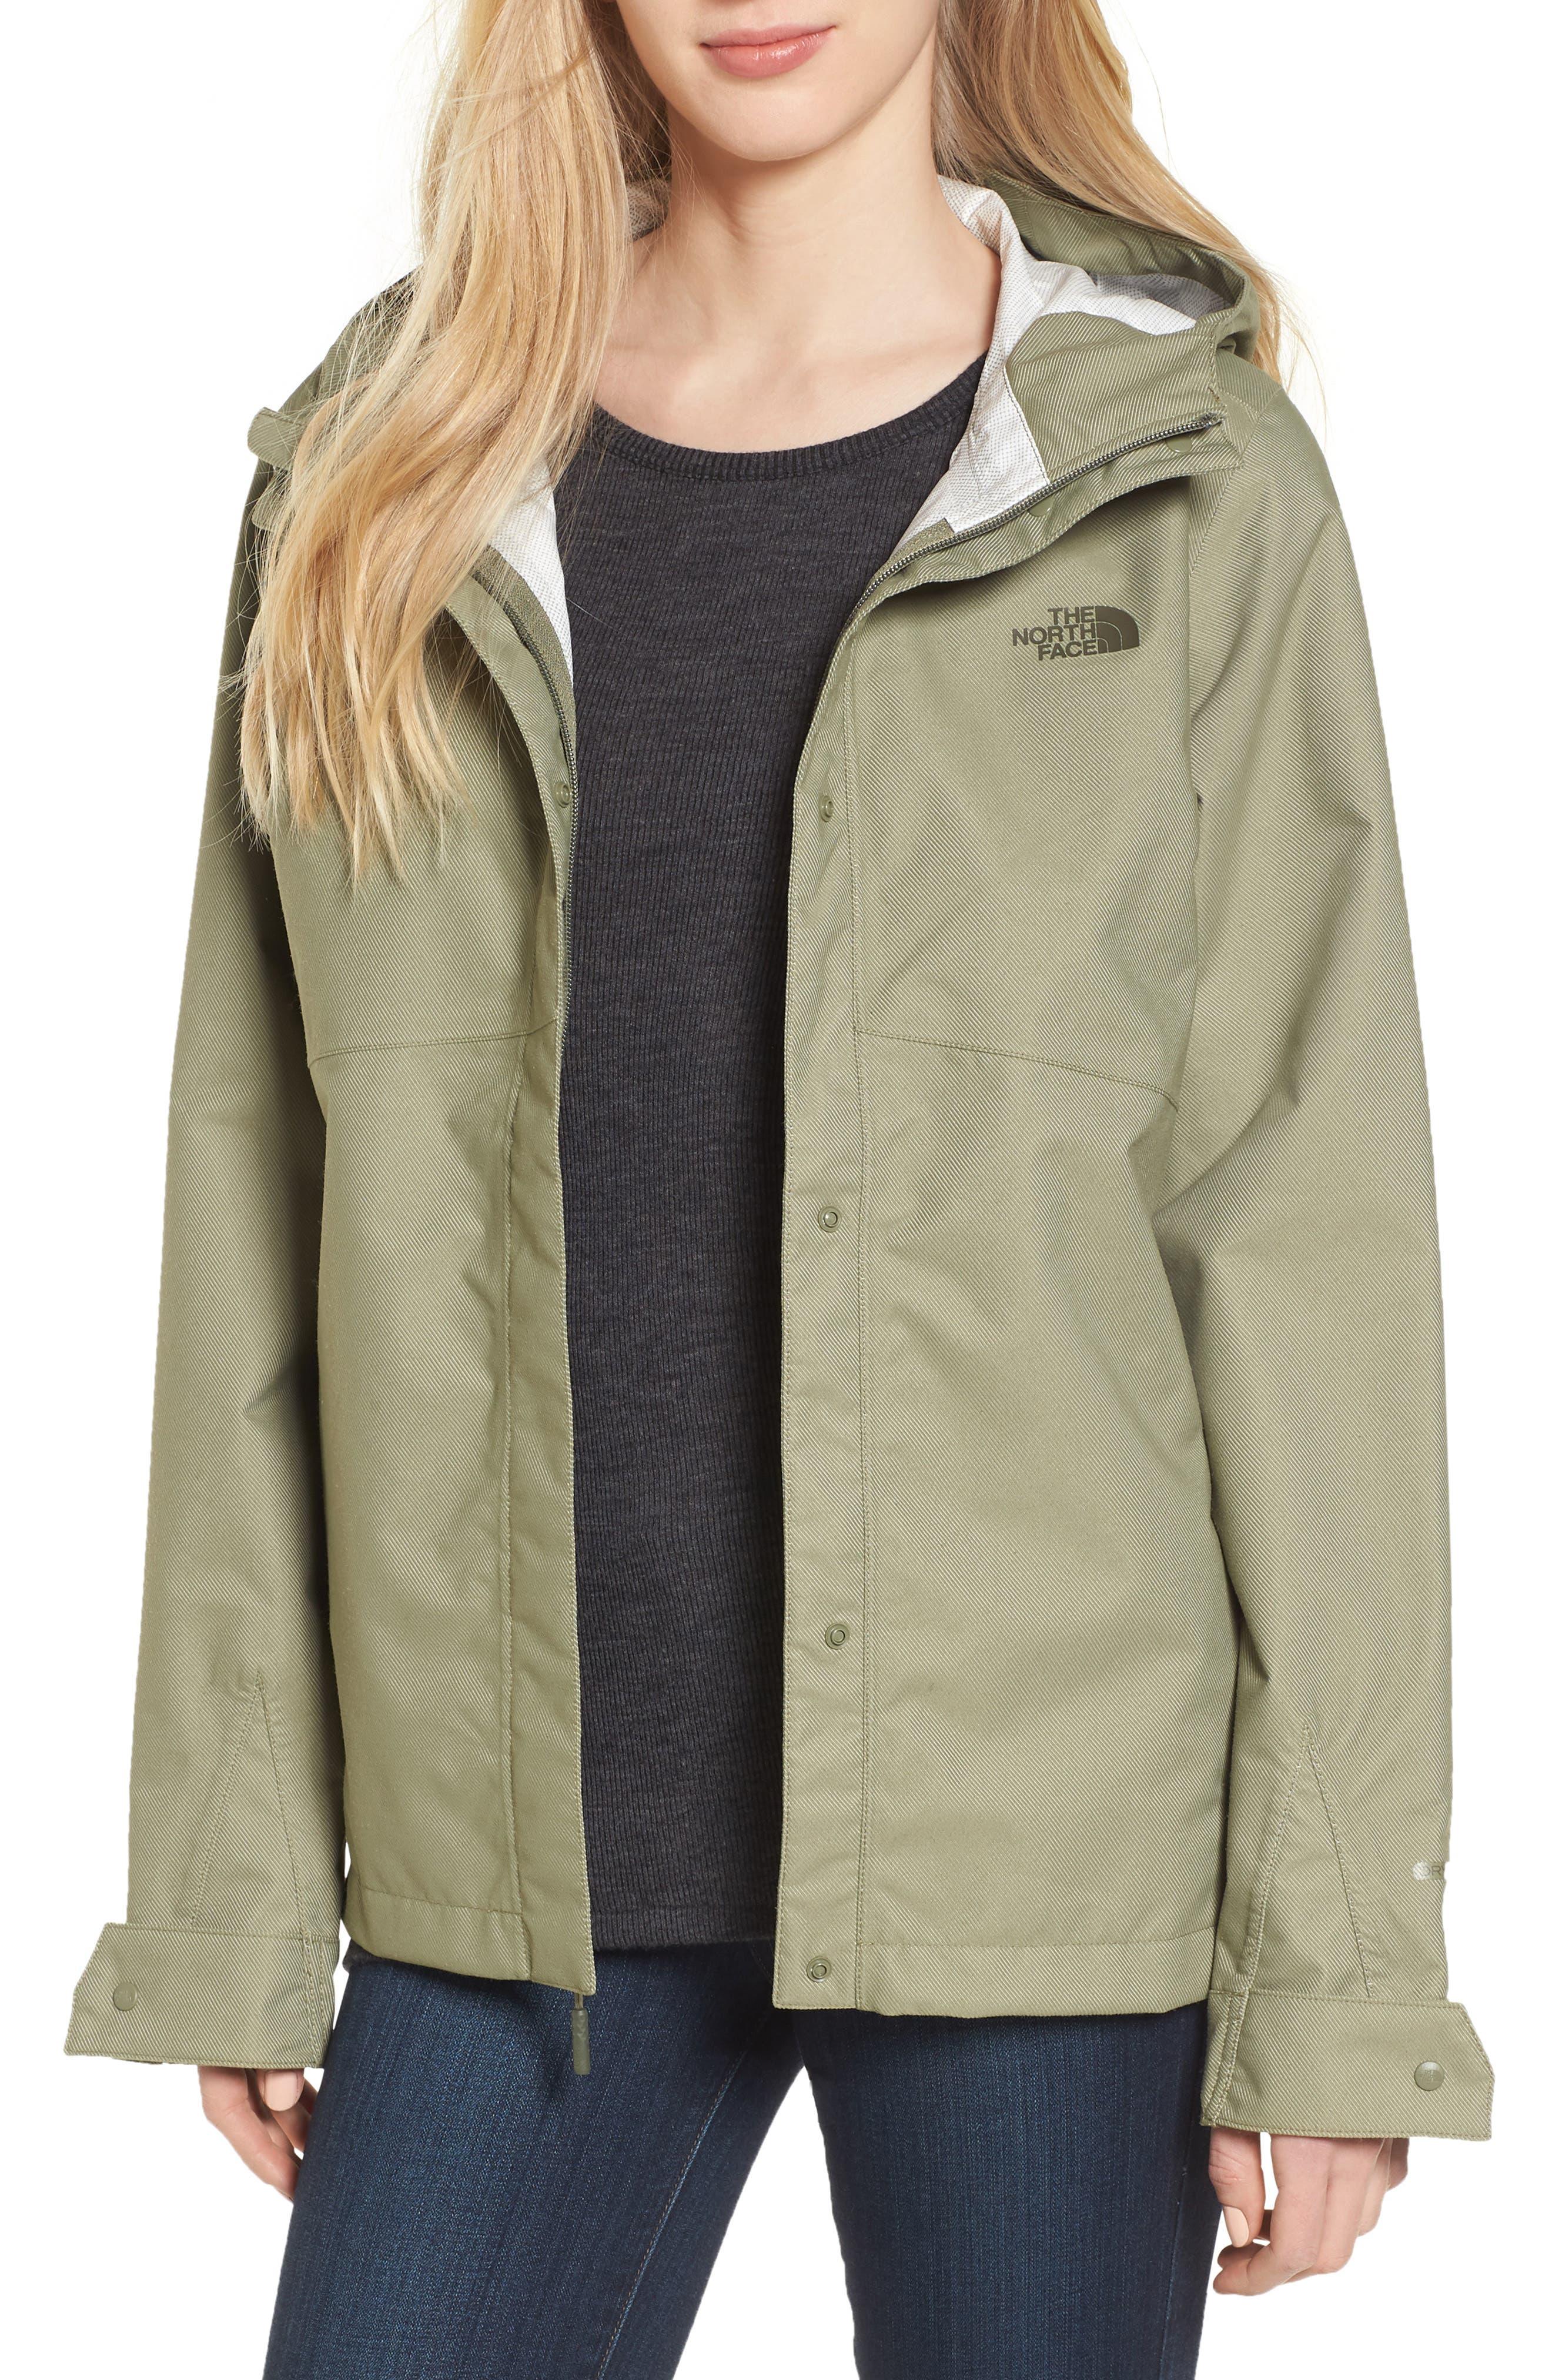 Berrien Waterproof Jacket,                         Main,                         color, 301